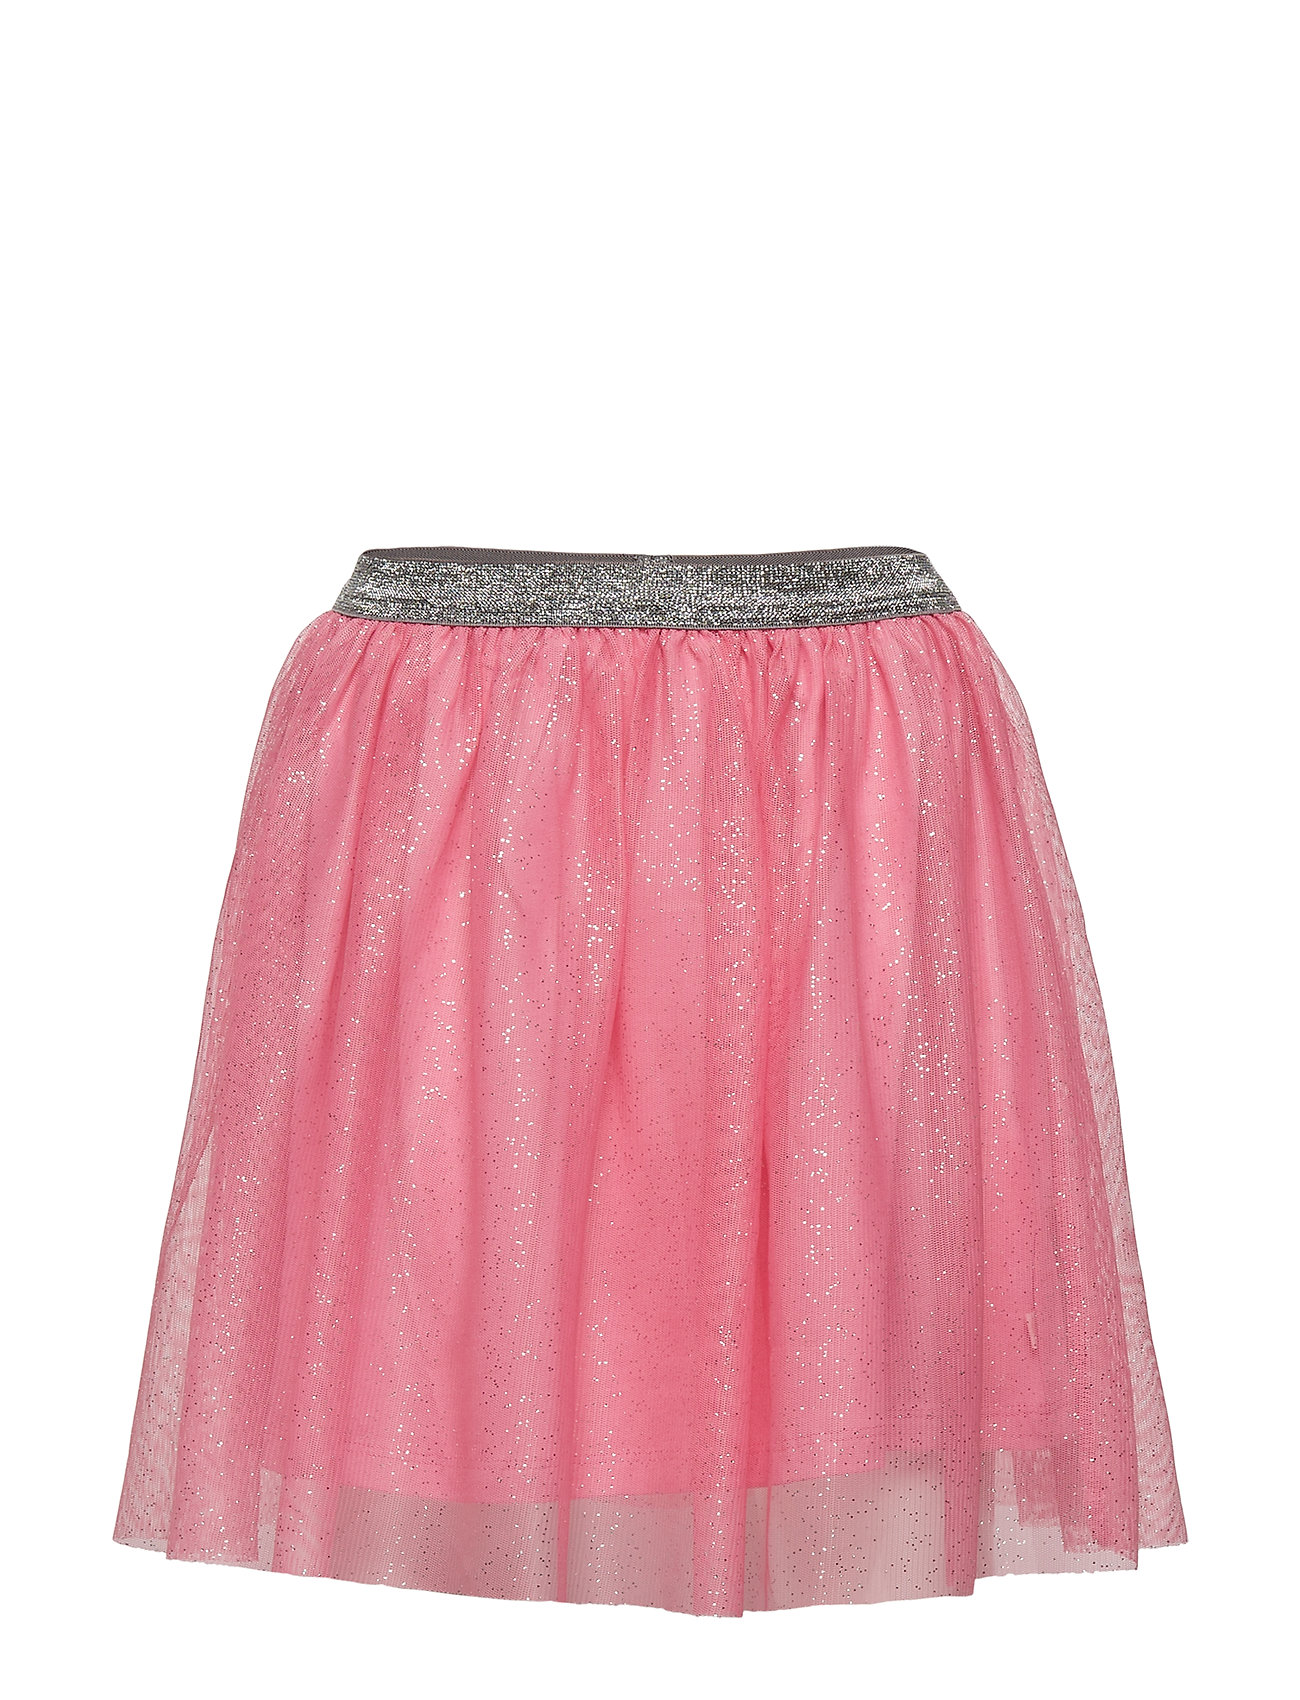 Småfolk Skirt. Tulle. Solid - SEA PINK